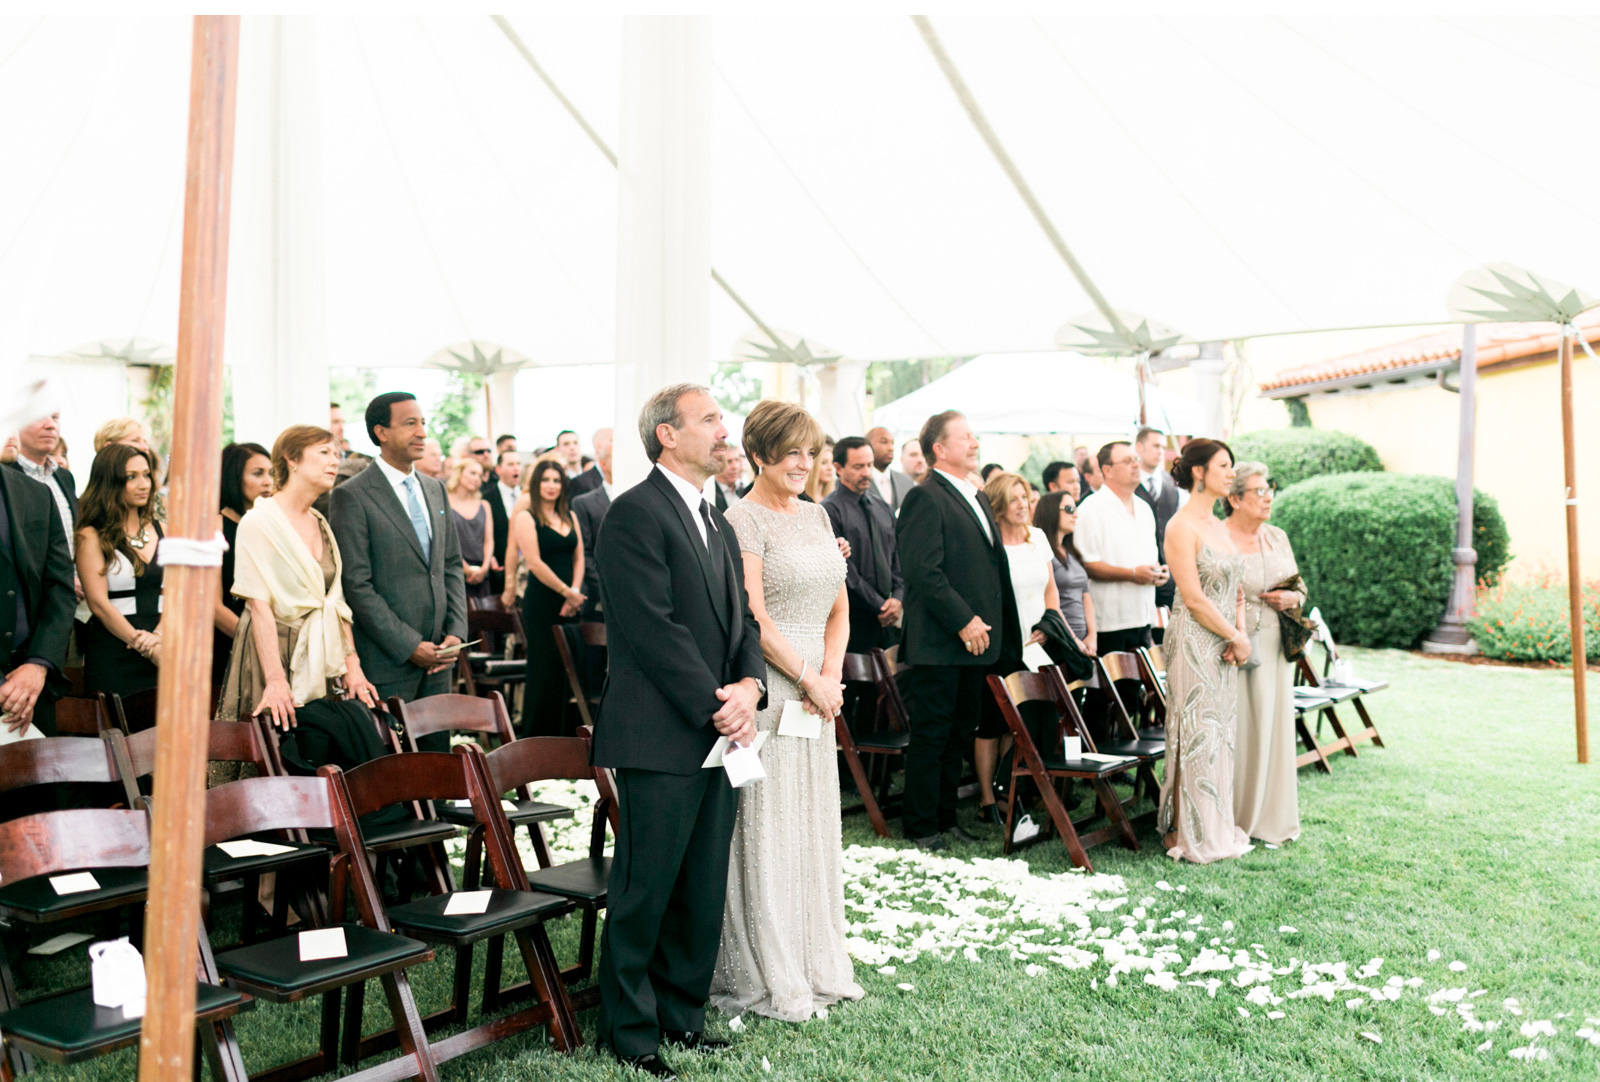 San-Diego-Wedding-Photographer-Natlaie-Schutt-Photography_05.jpg